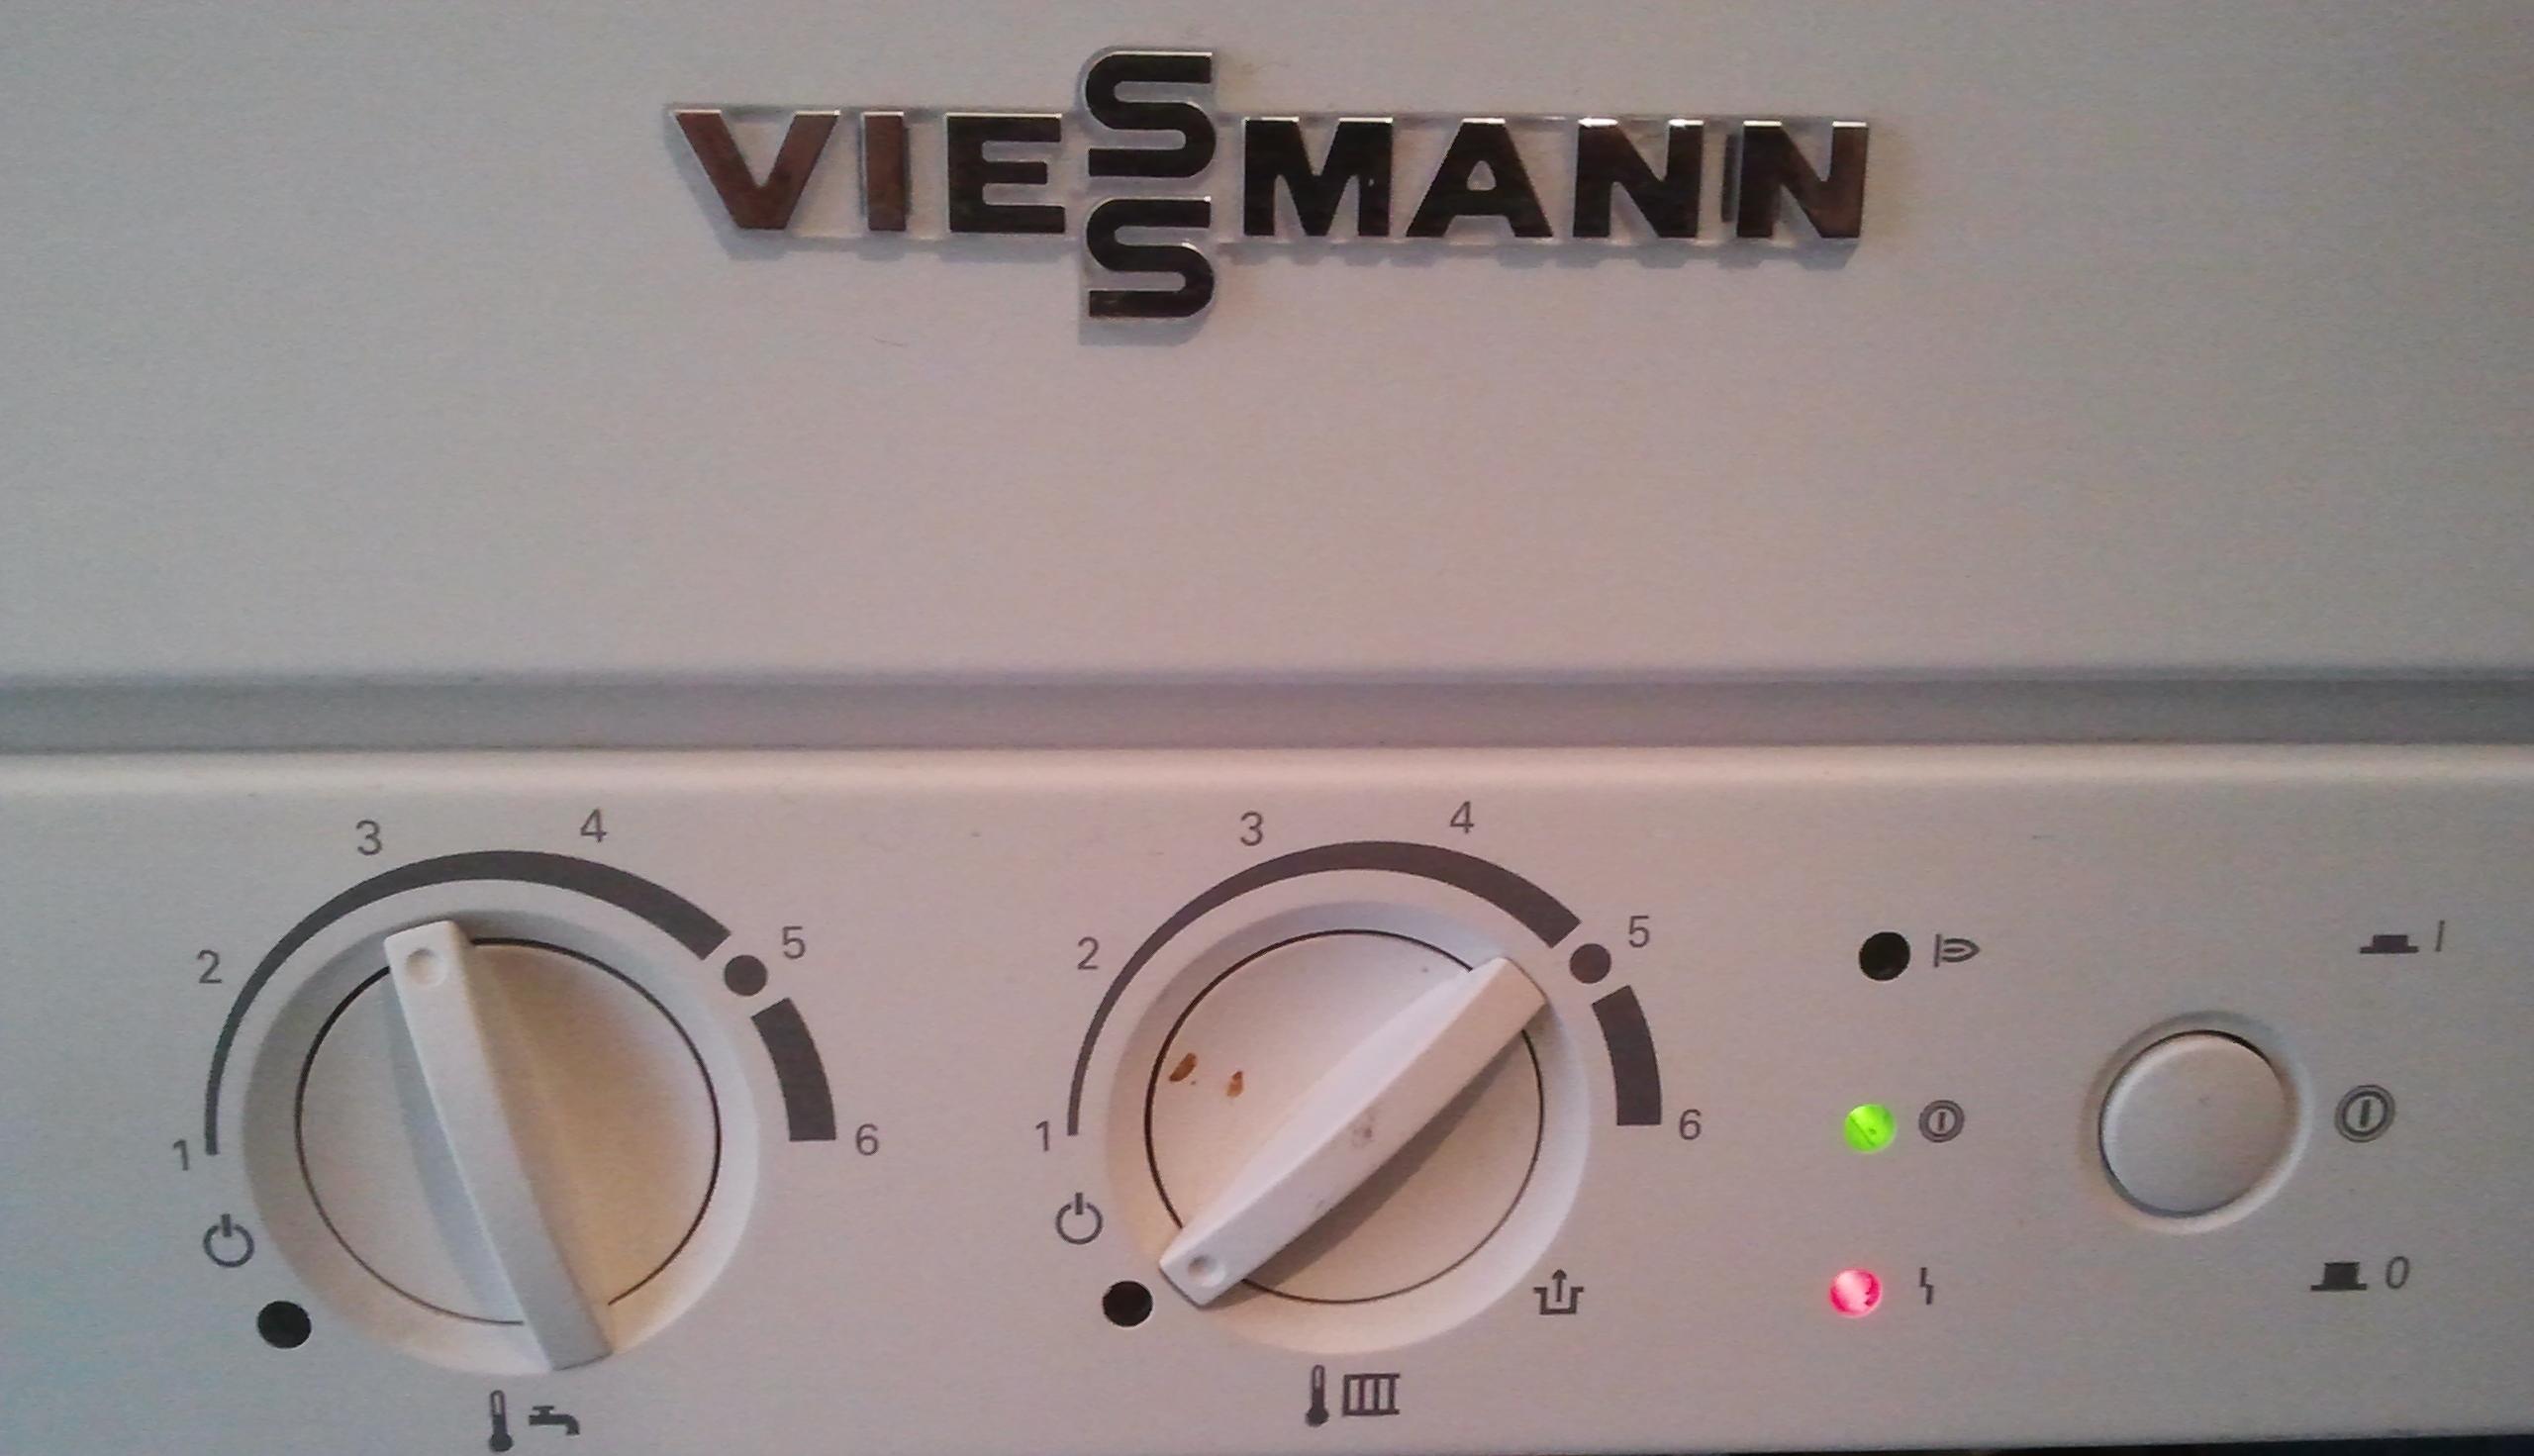 Viessmann\\Vitopend 100 - brak ciep�ej wody, a pompa ci�gle dzia�a